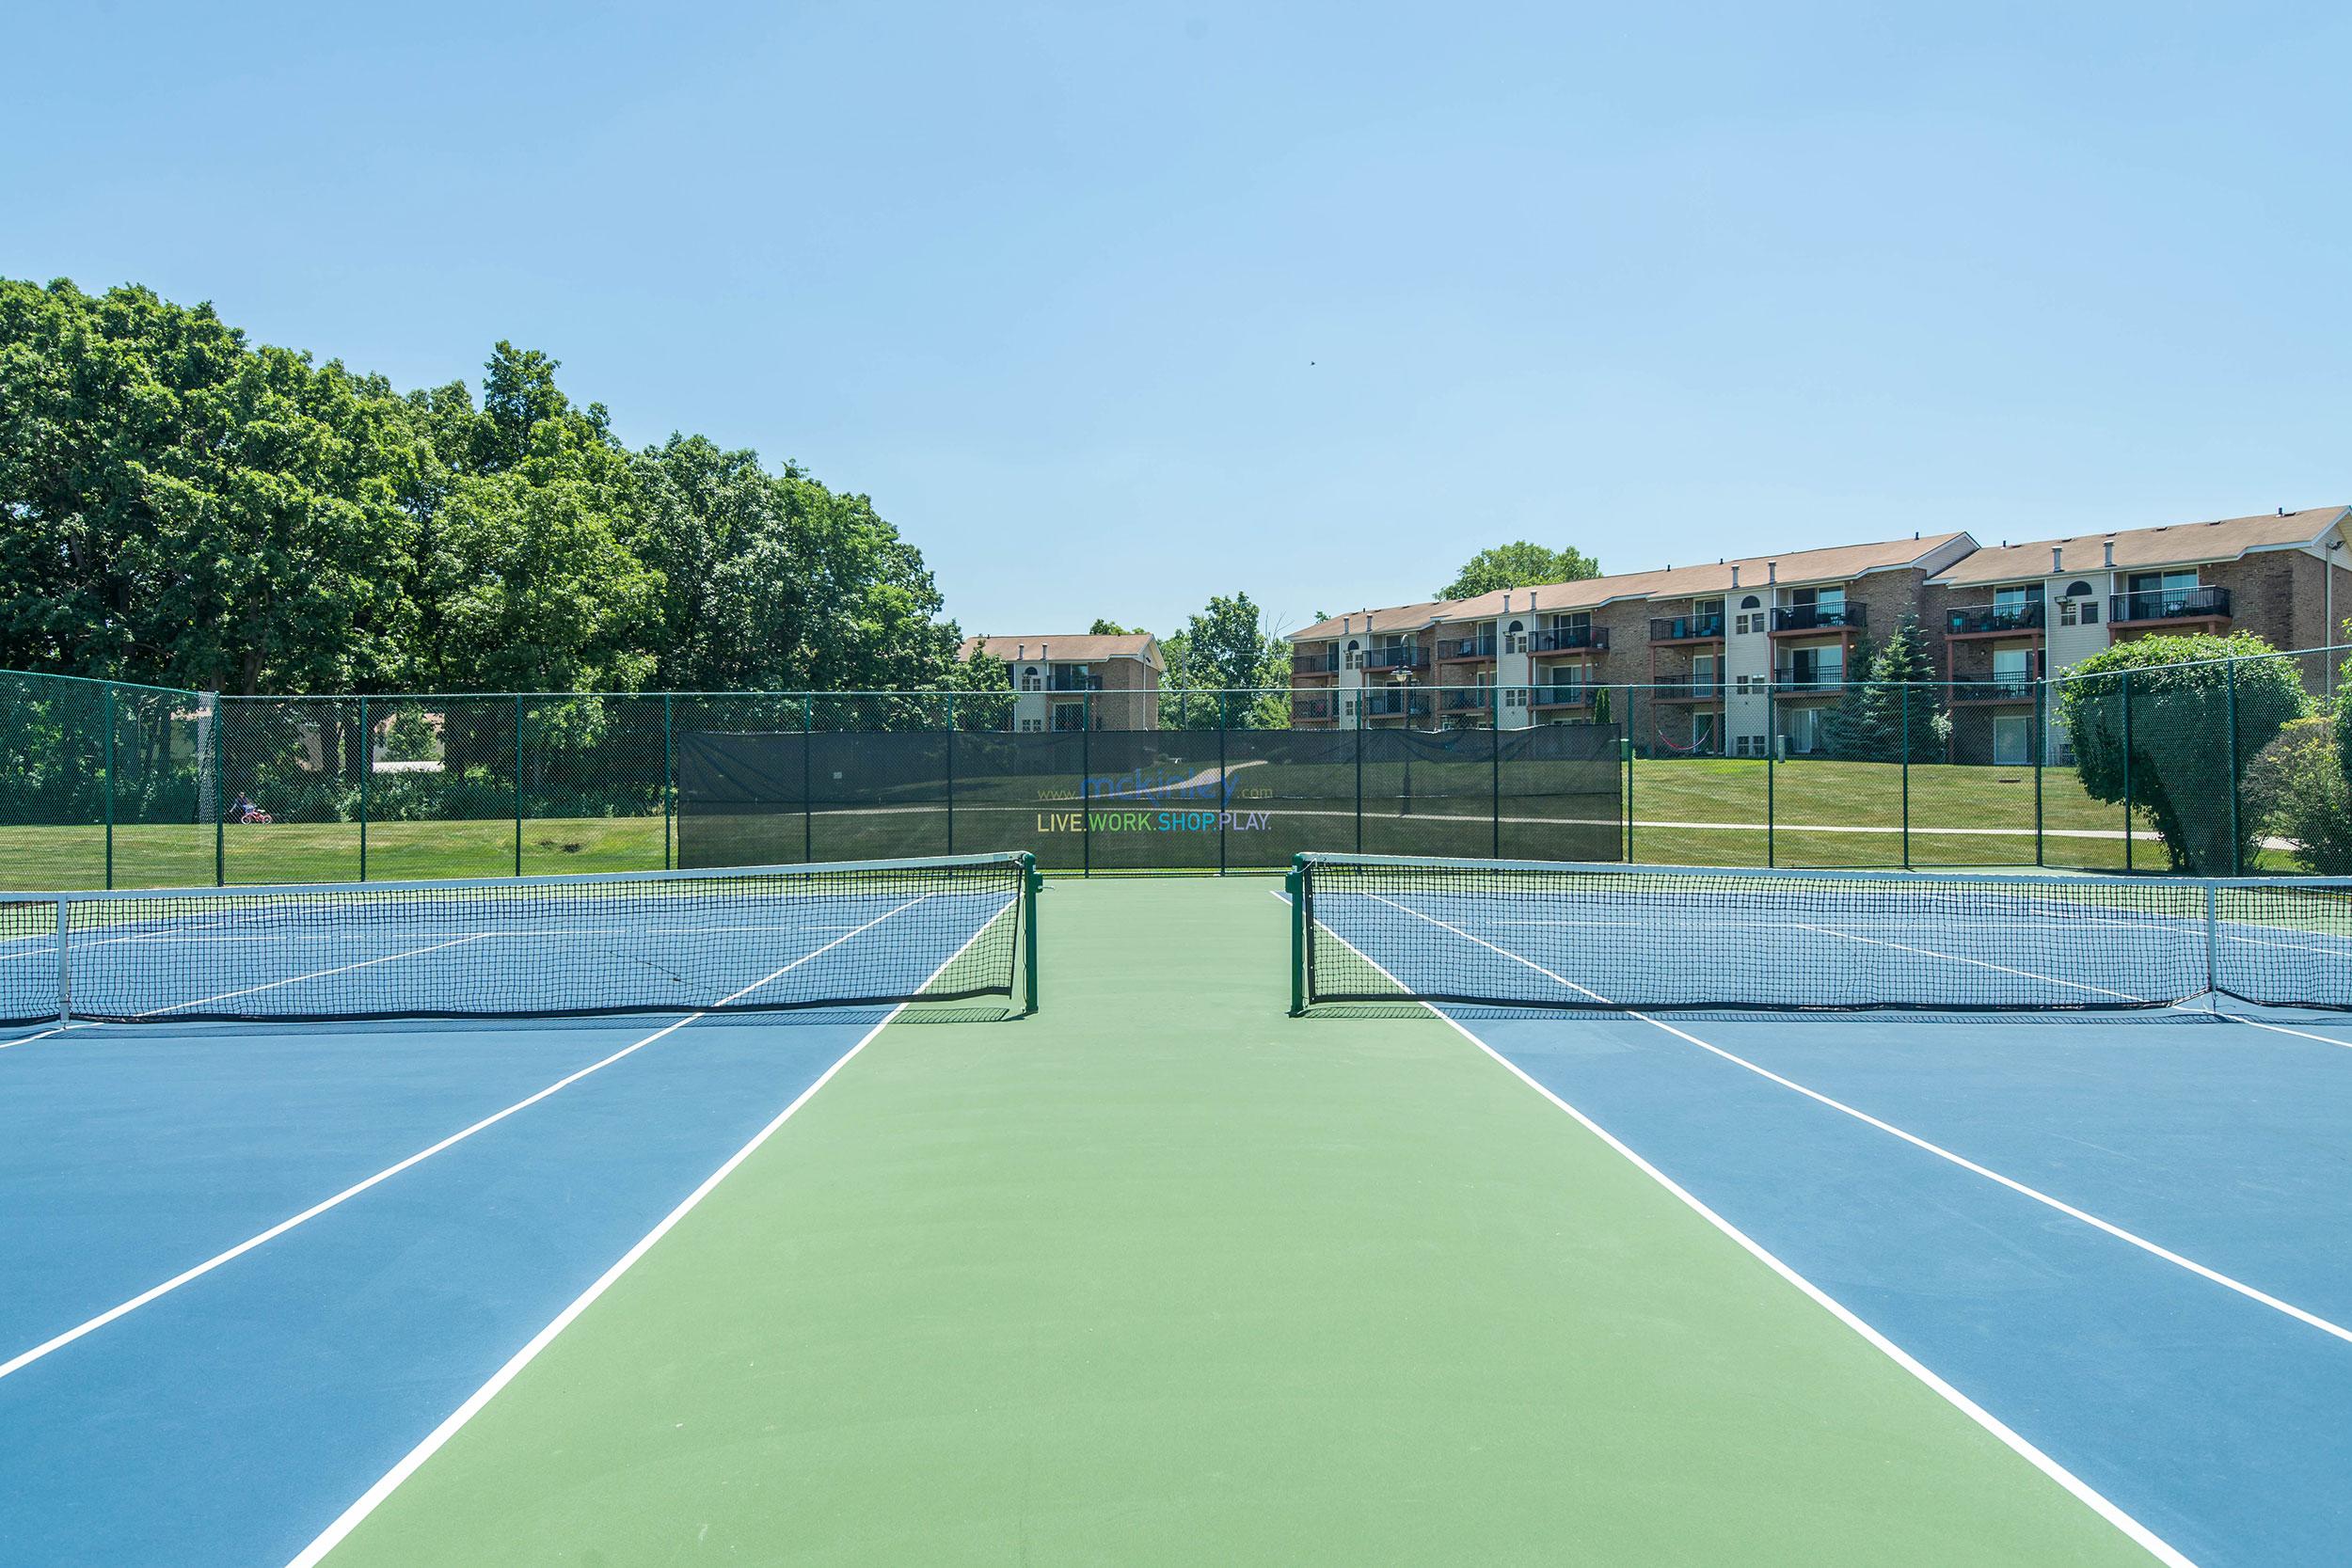 Gsl-amen-tennis